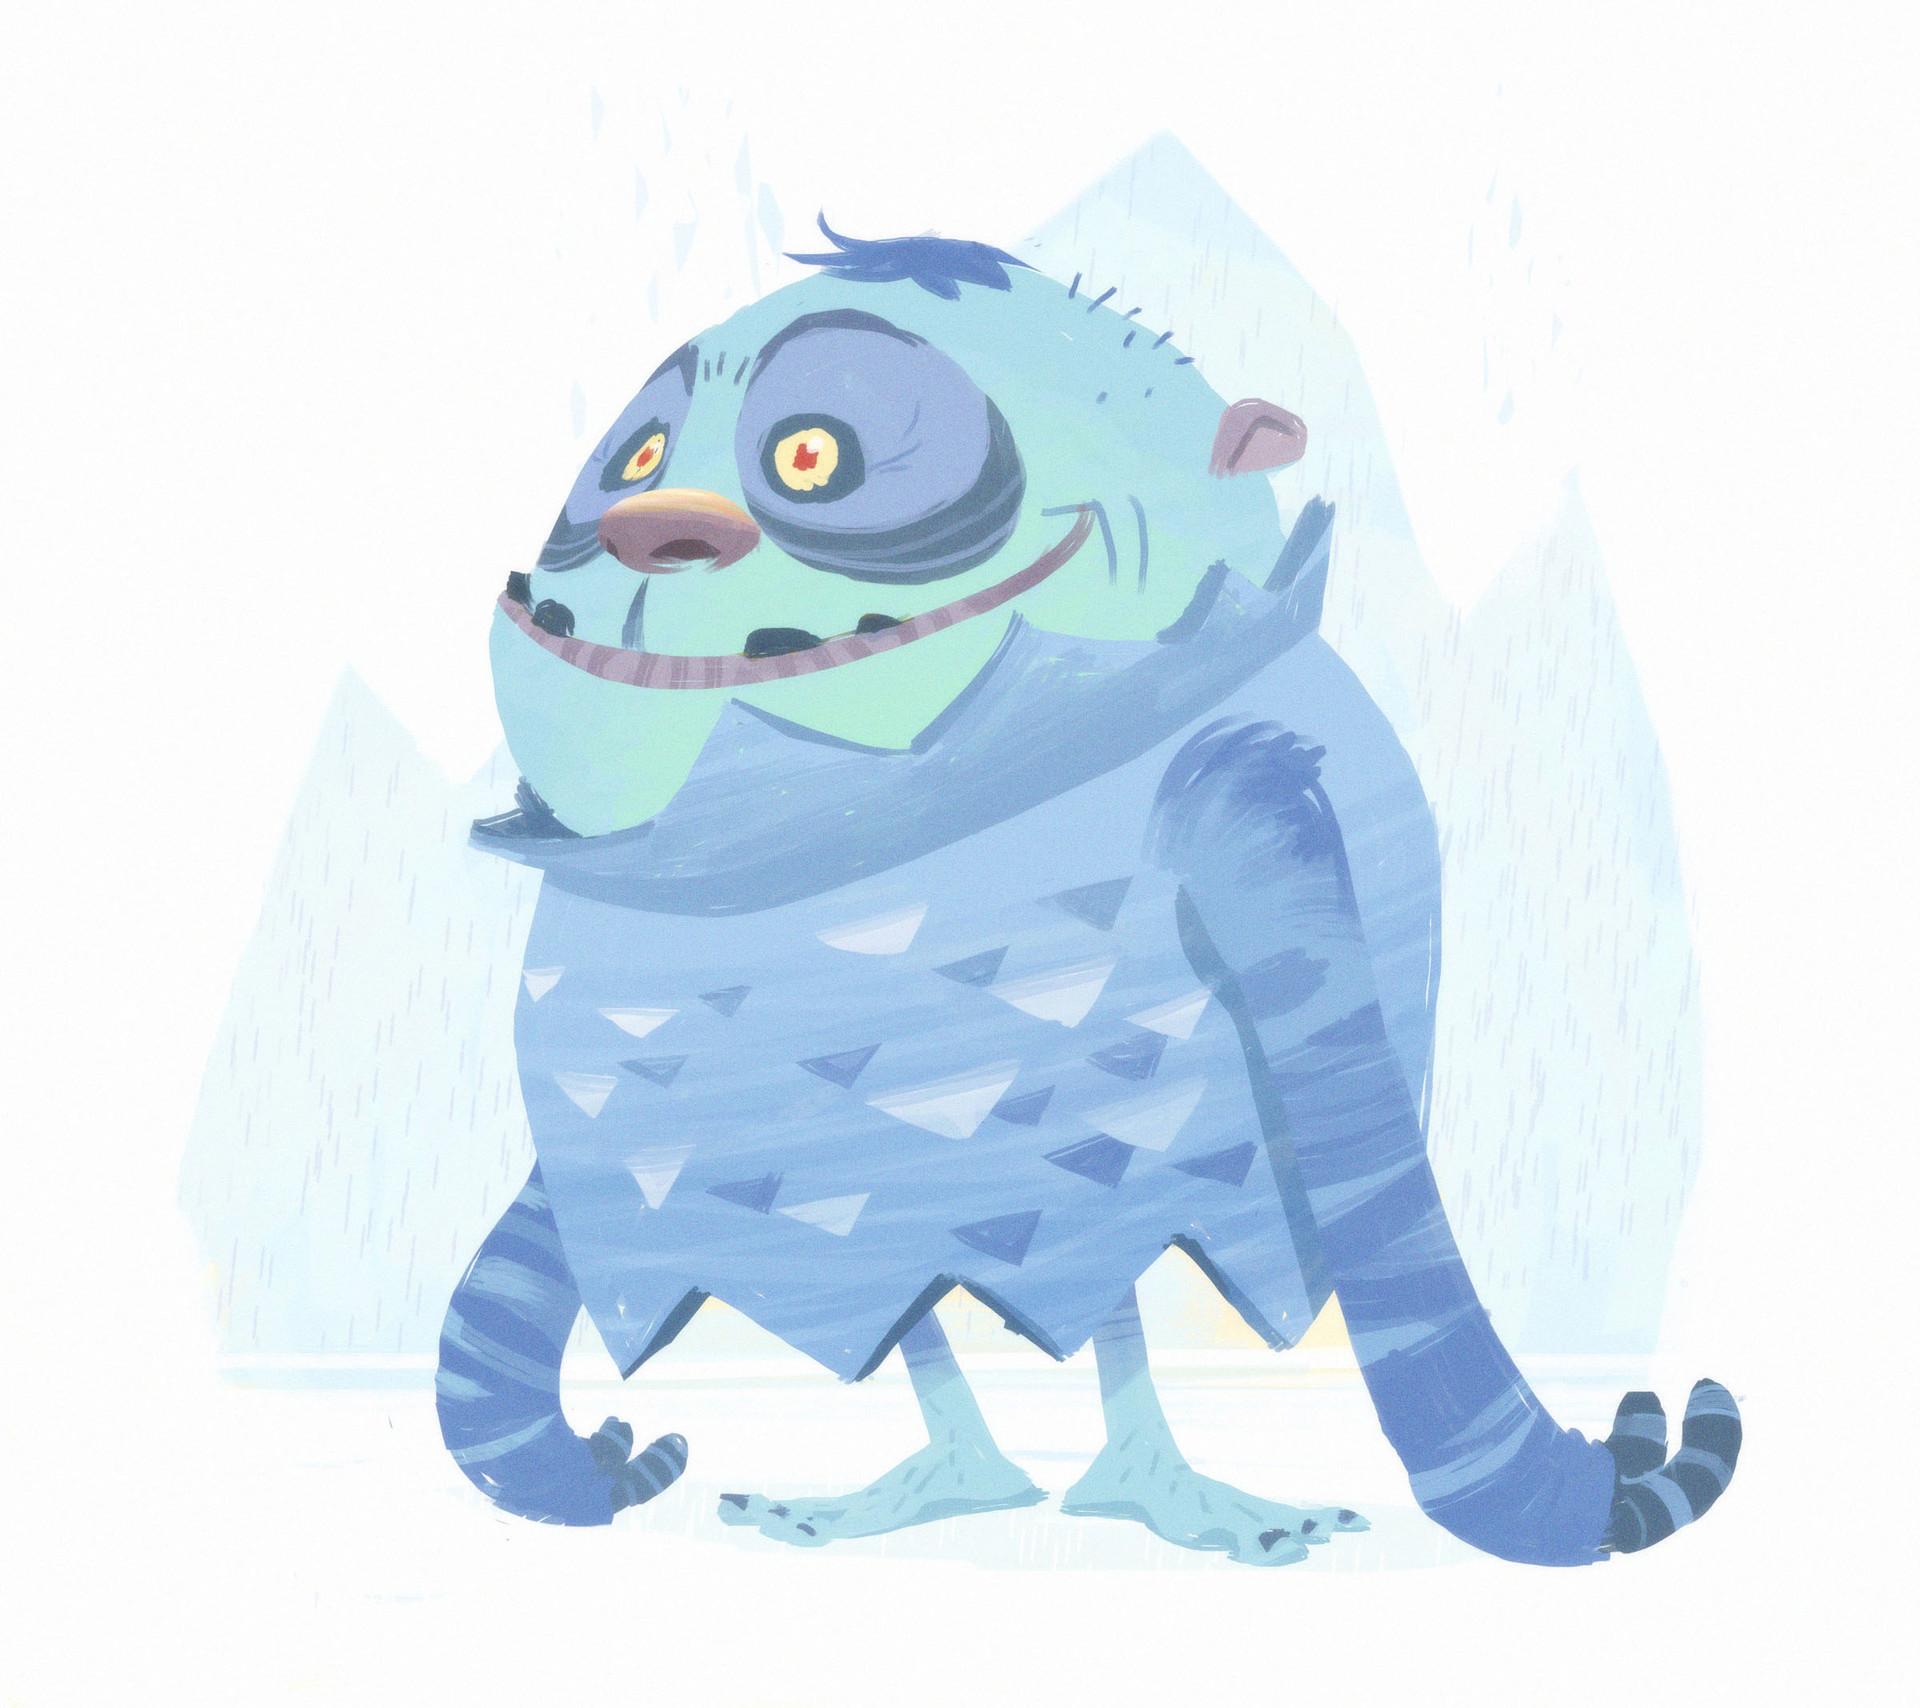 Rustam hasanov iceman2